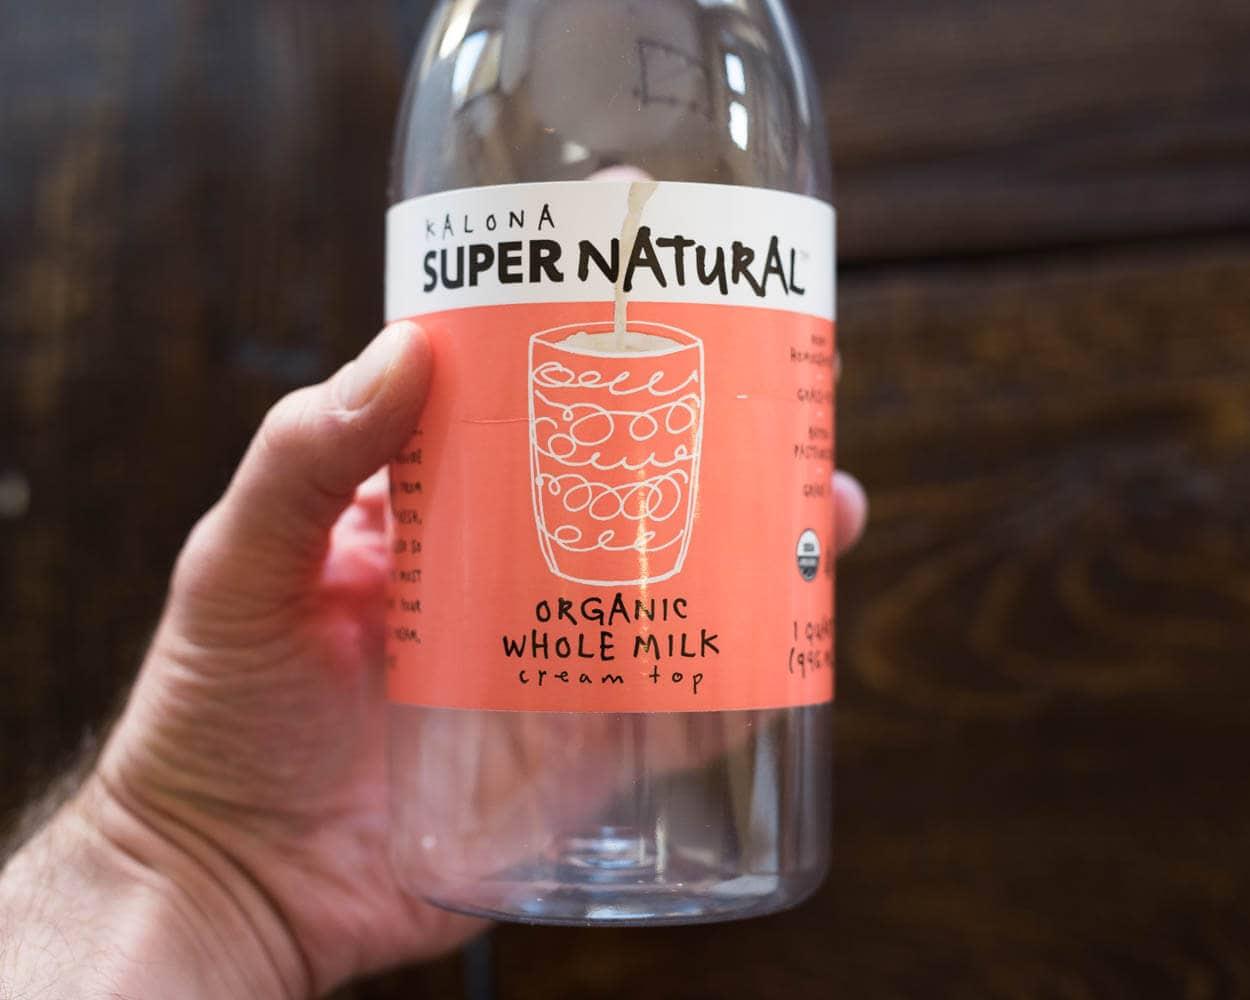 Kalona Supernatural Milk